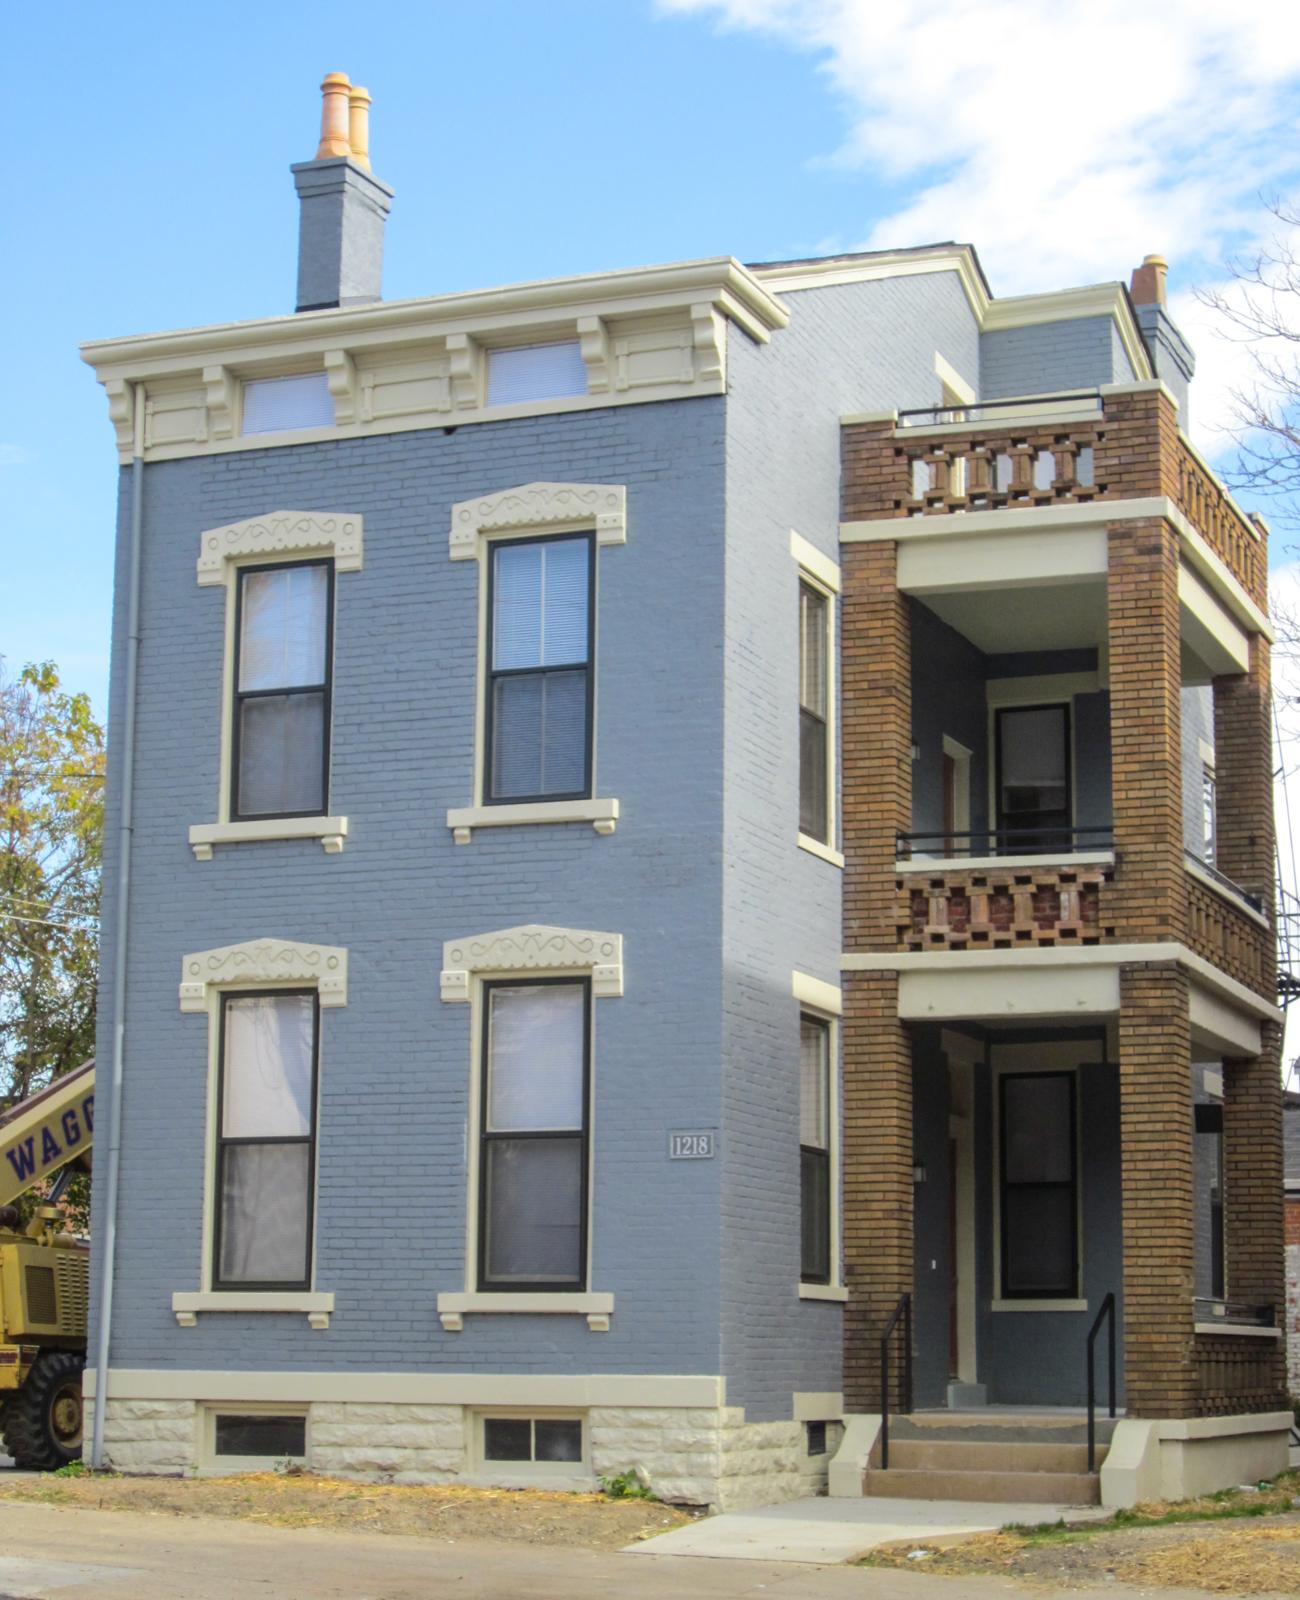 Eastside Historic Exterior 2